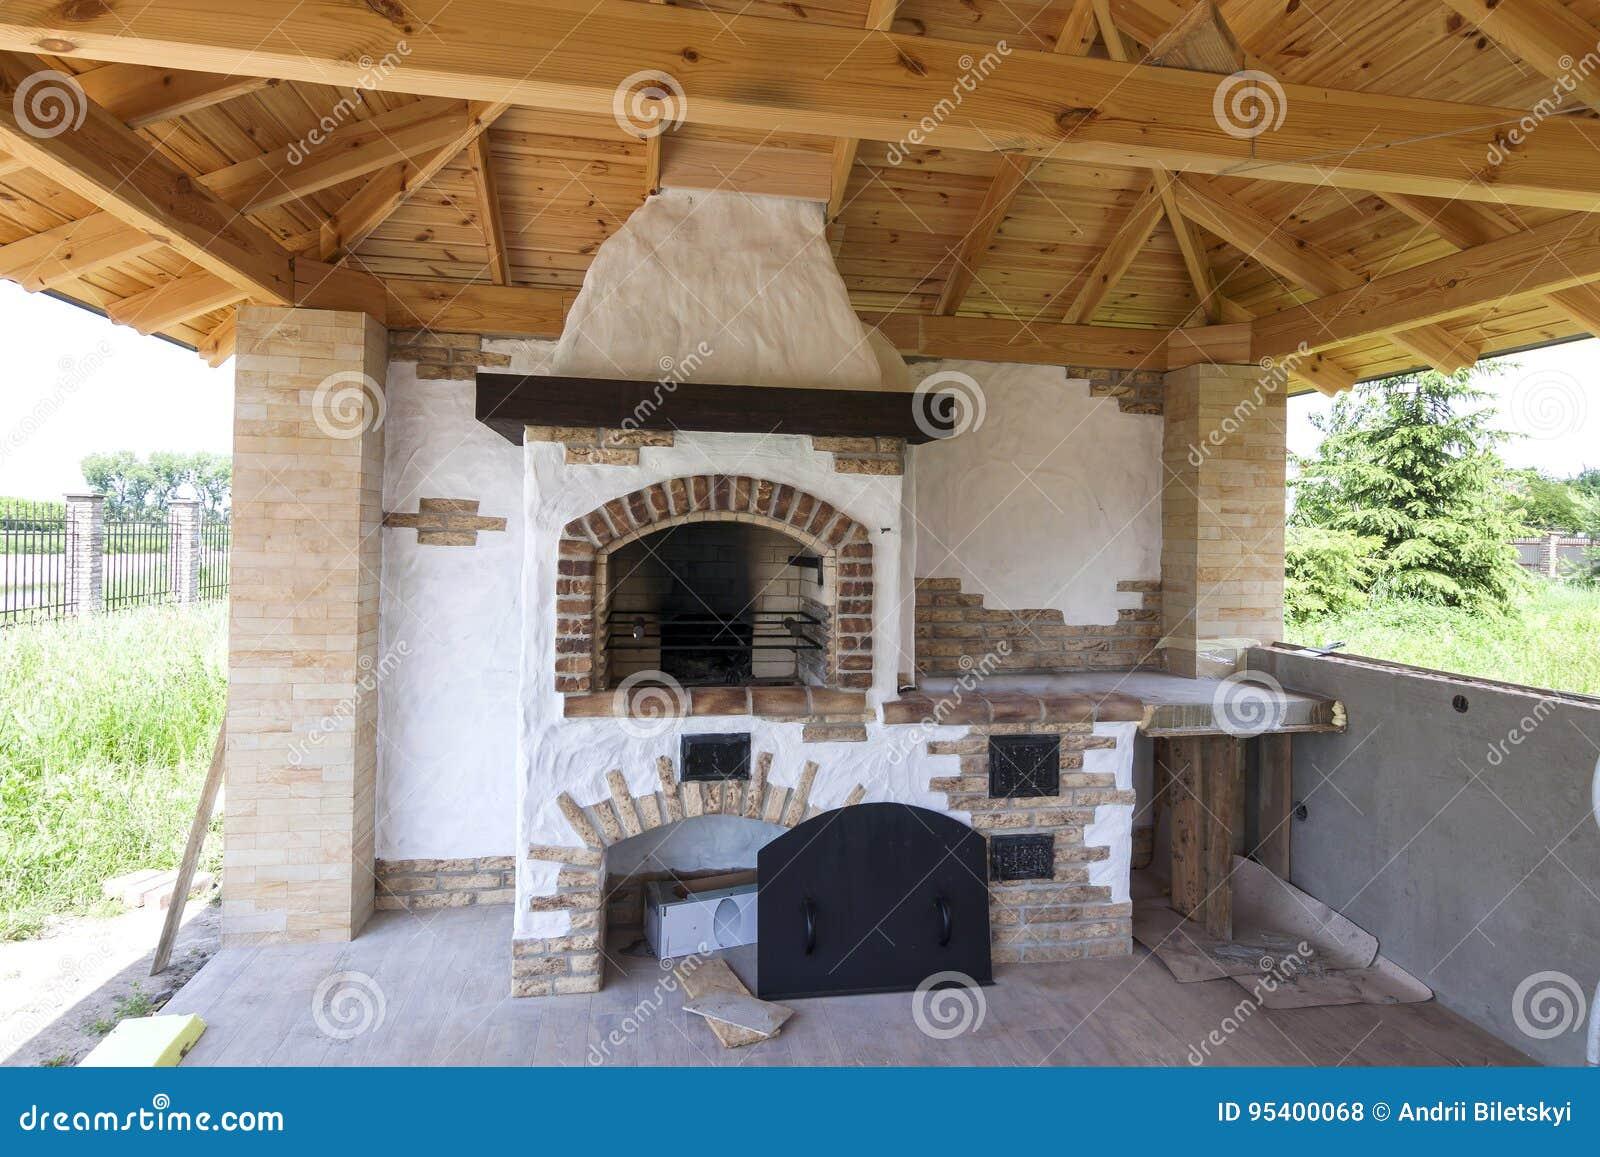 Architektur, Haus im altem Stil, Portal mit Grillkamin outdoo